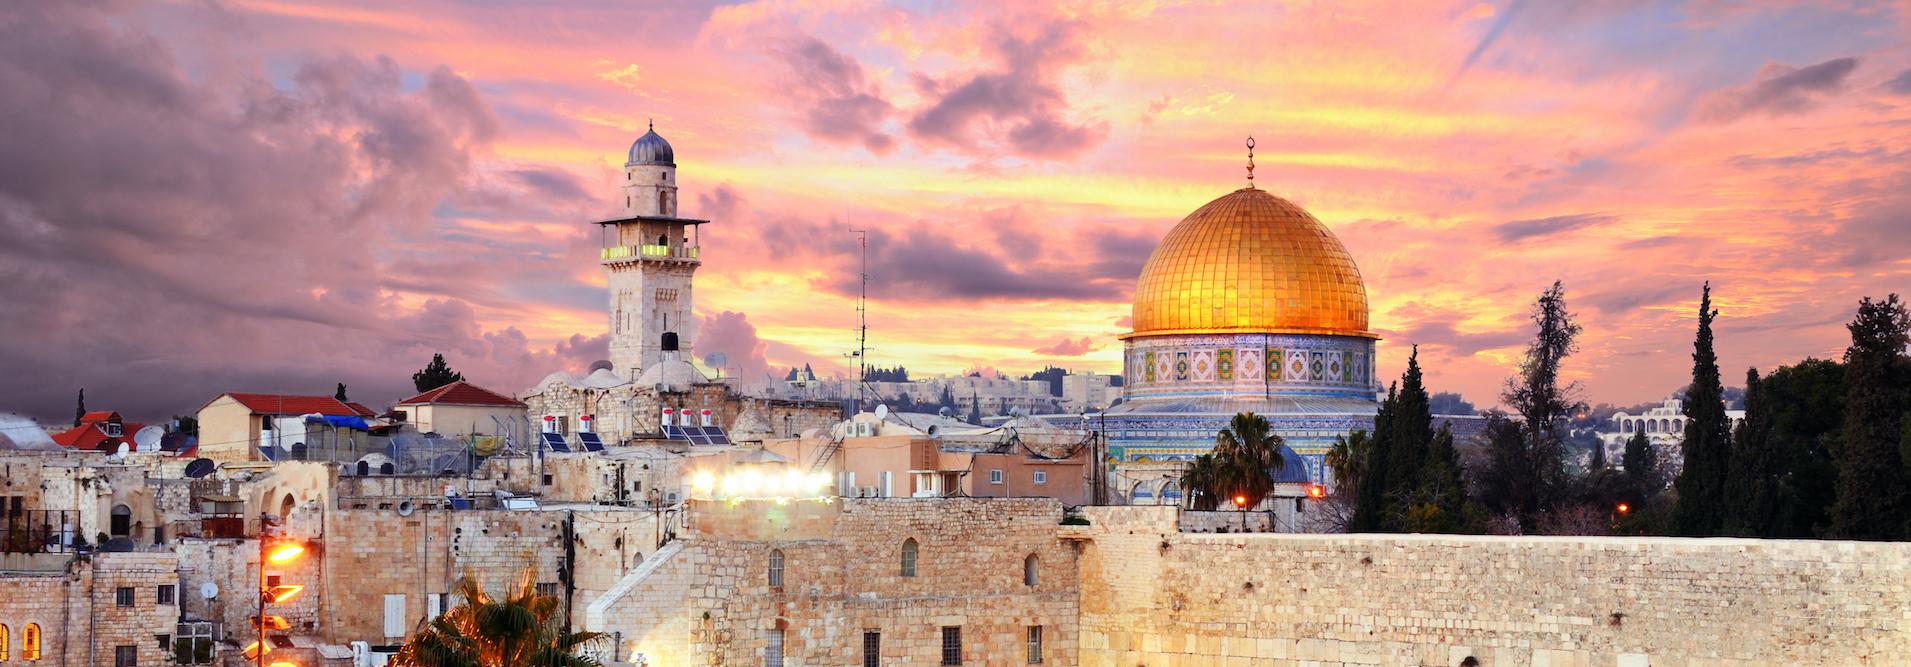 Jerusalem & Surroundings (5 nights) from £1145pp